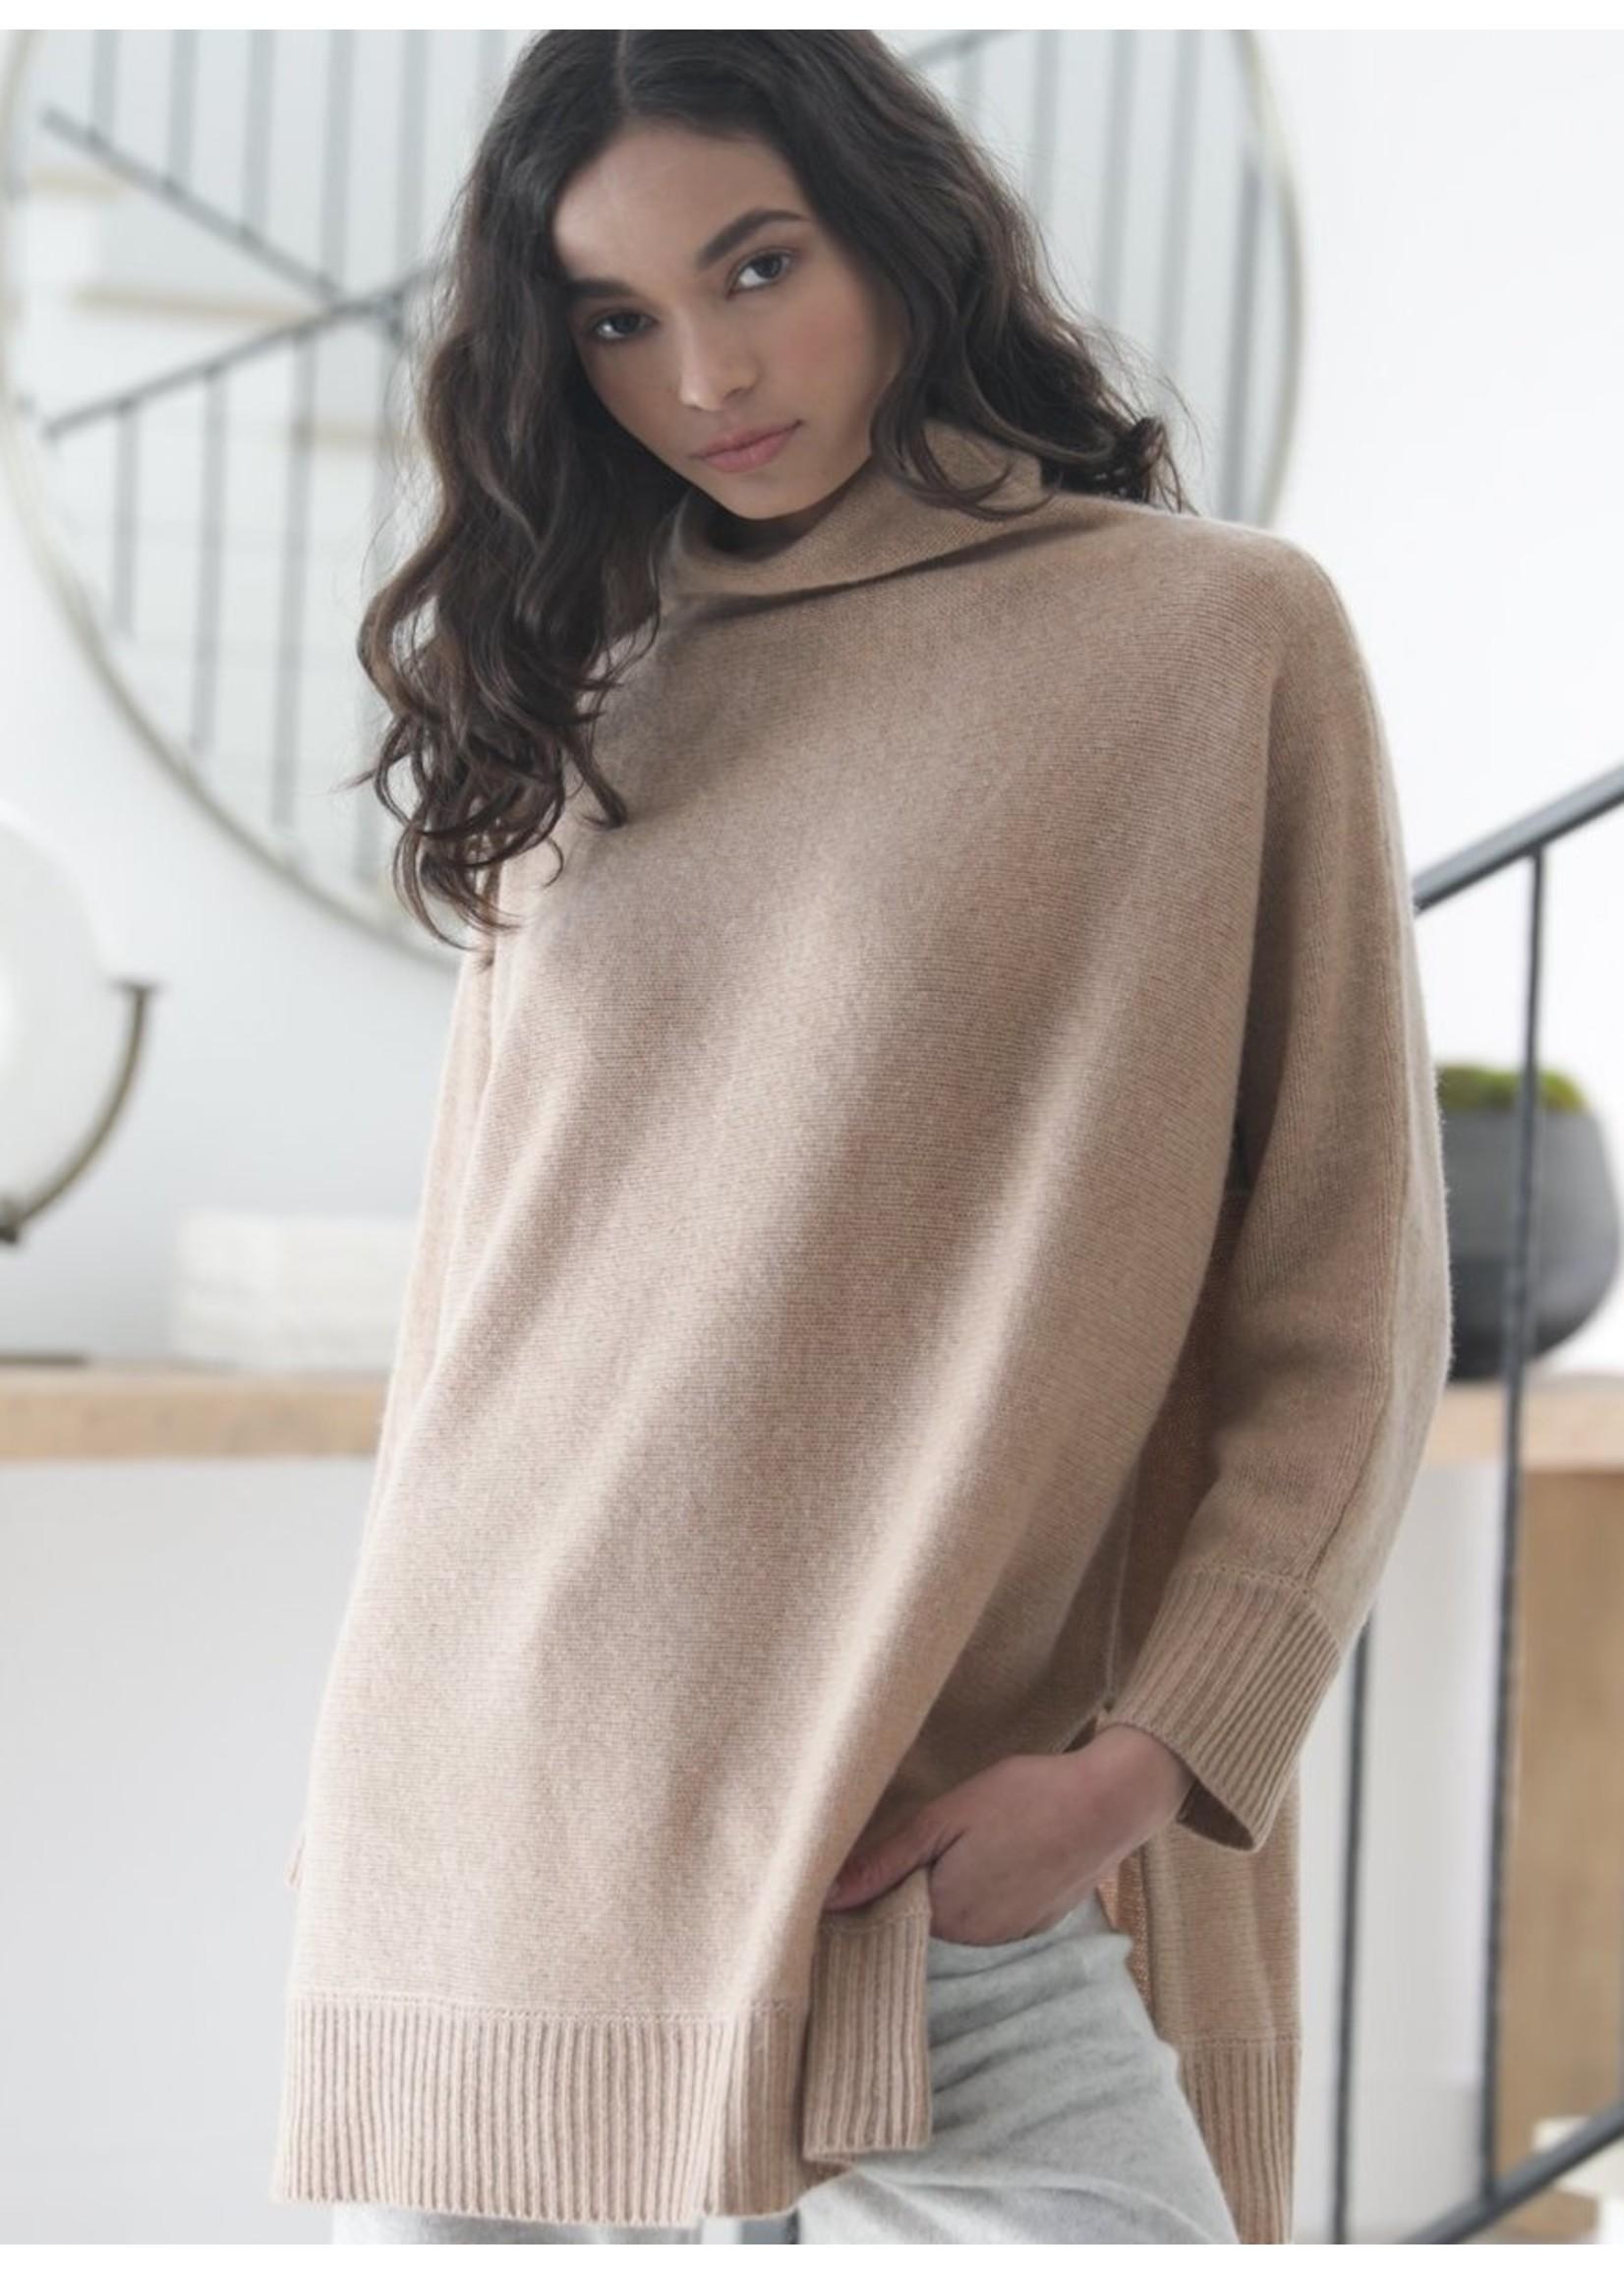 Oats Cashmere Oats Cashmere Estella Oversized Cashmere Pullover